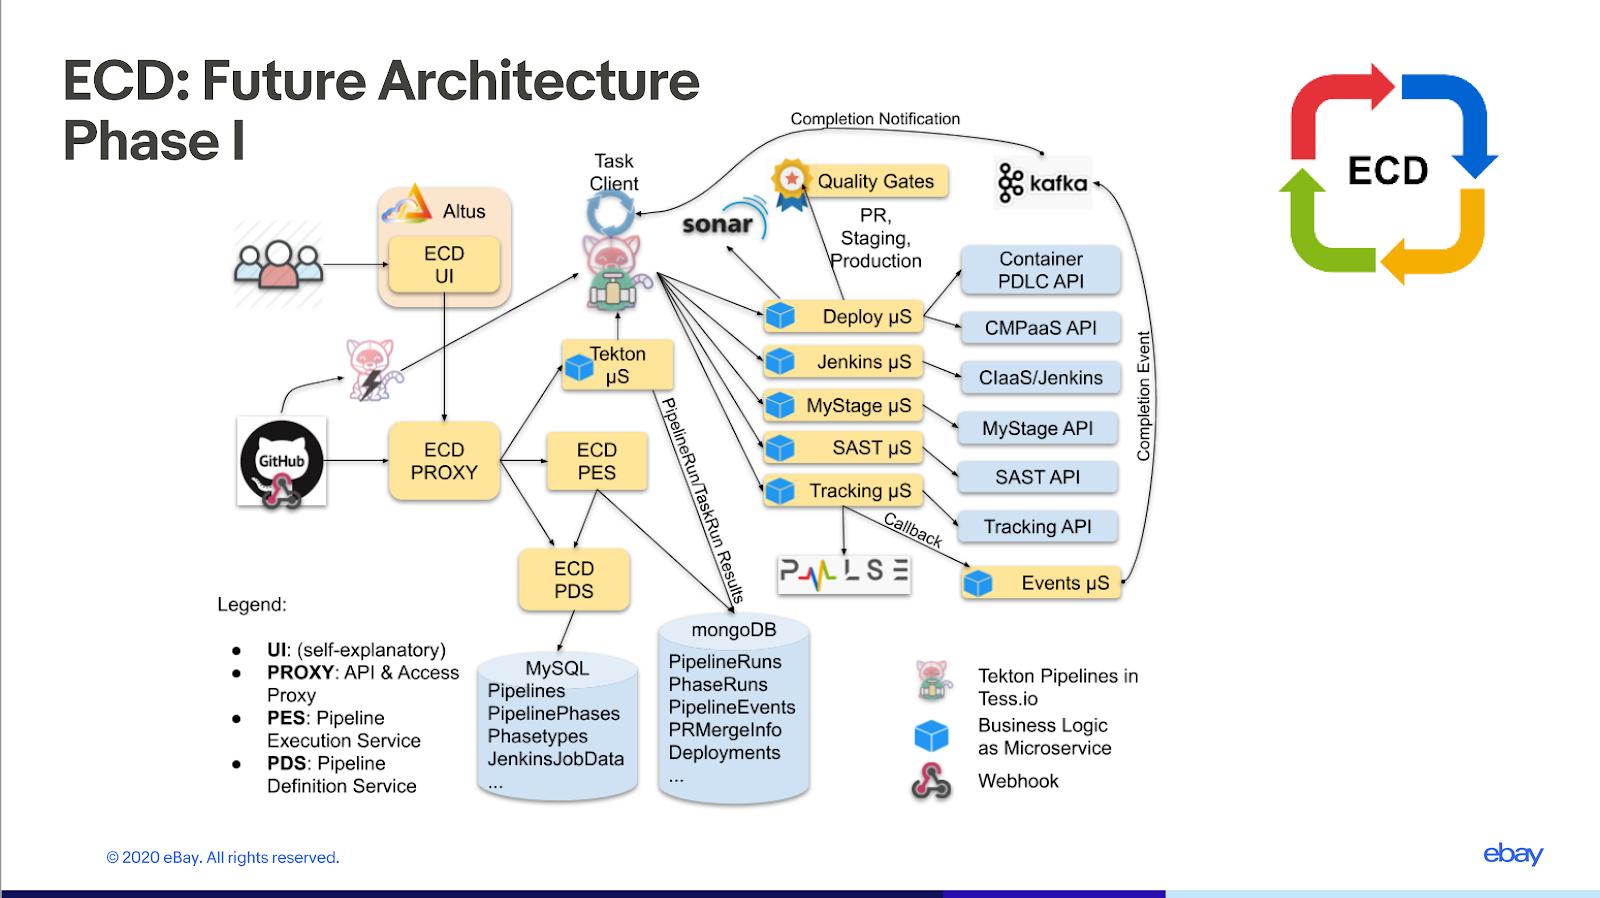 ECD: Future of Architecture Phase 1 eBay slide